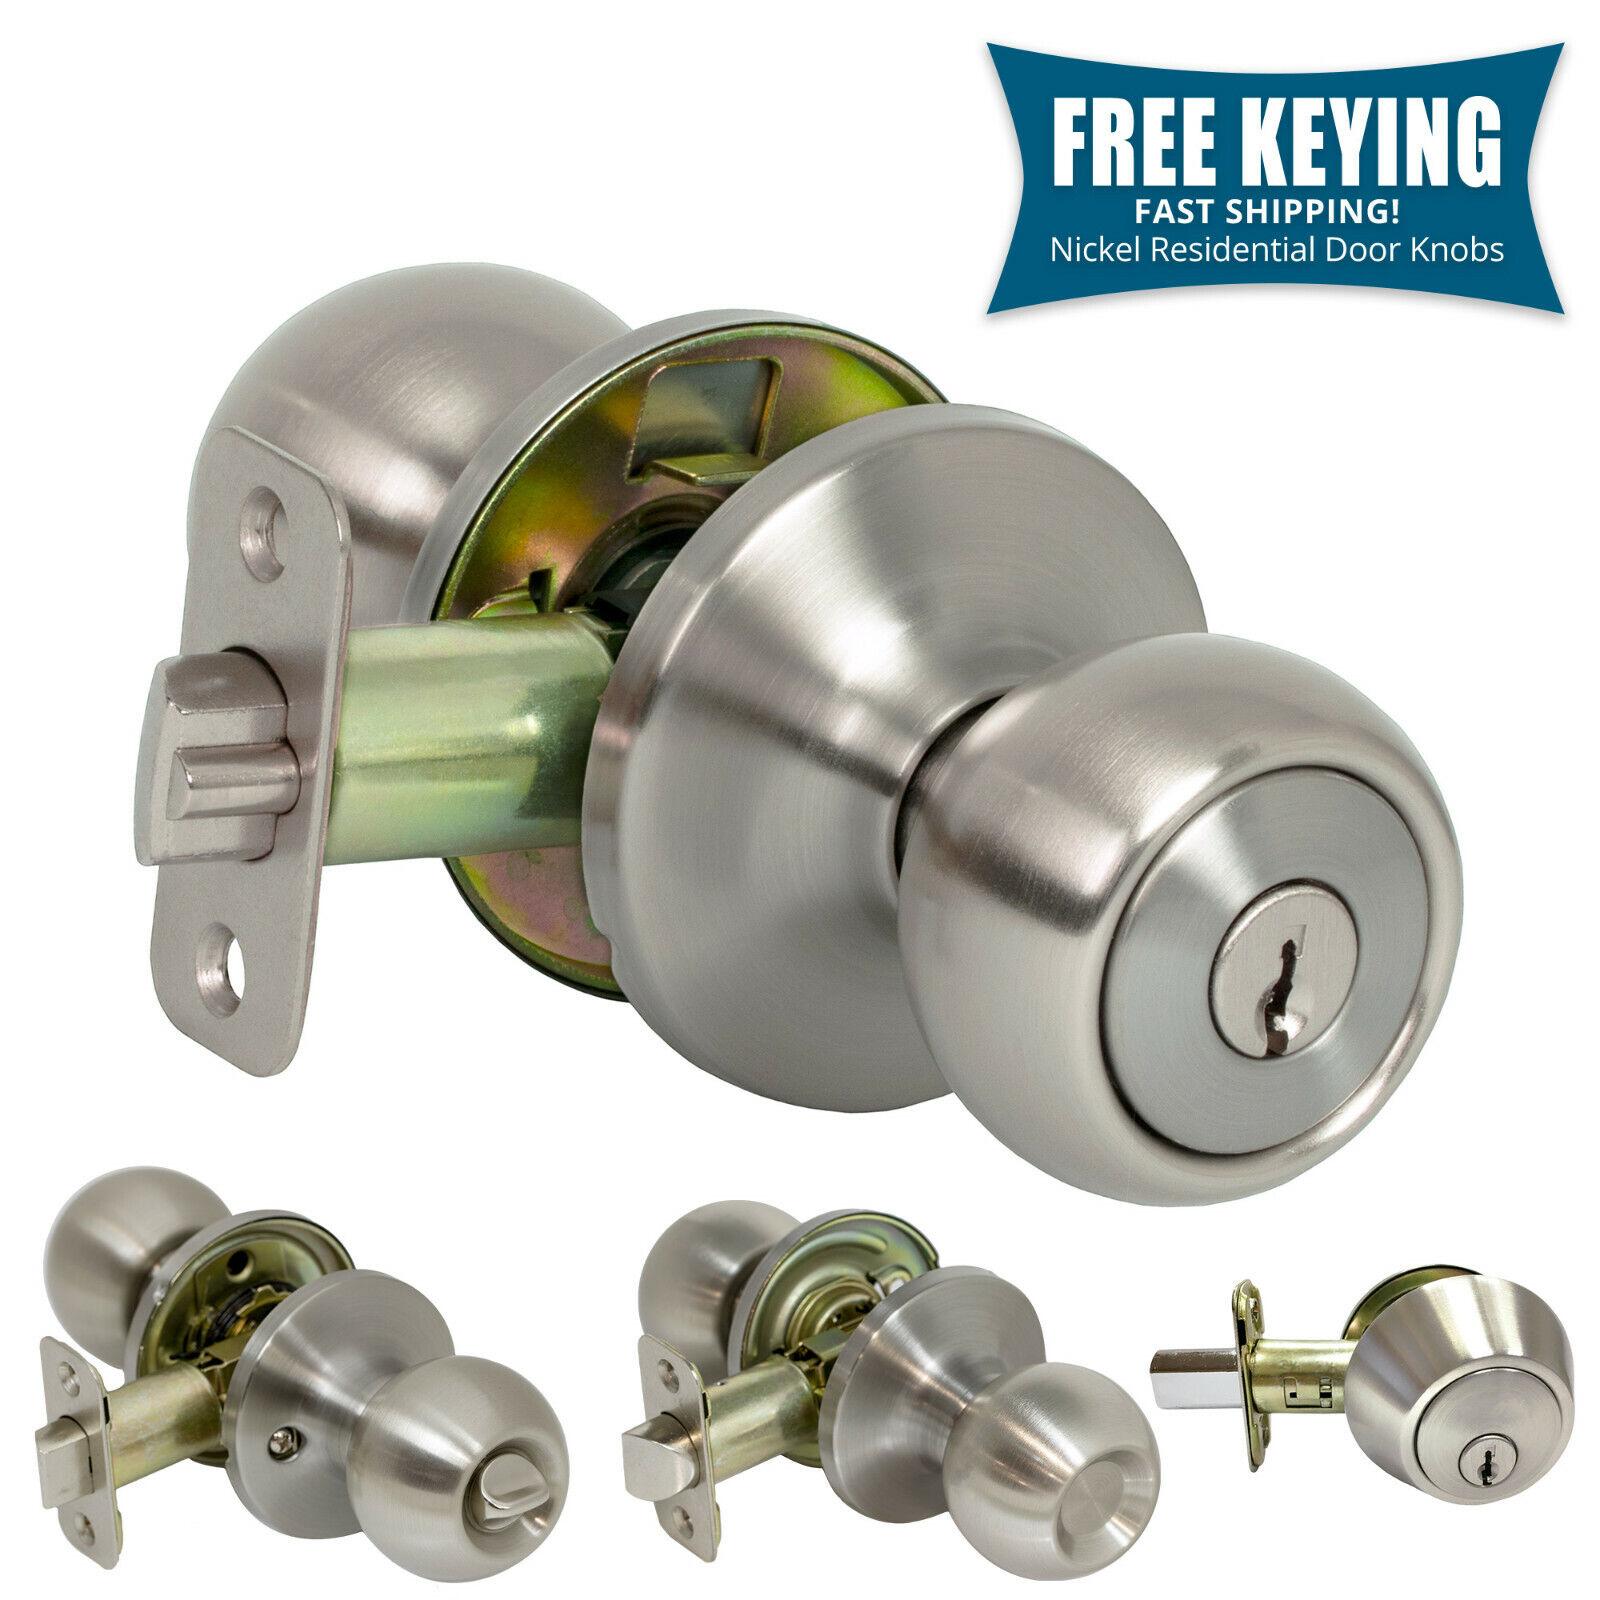 Pro-Grade Round Ball Door Knob Keyed Entry Home Hardware, Satin Nickel Building & Hardware